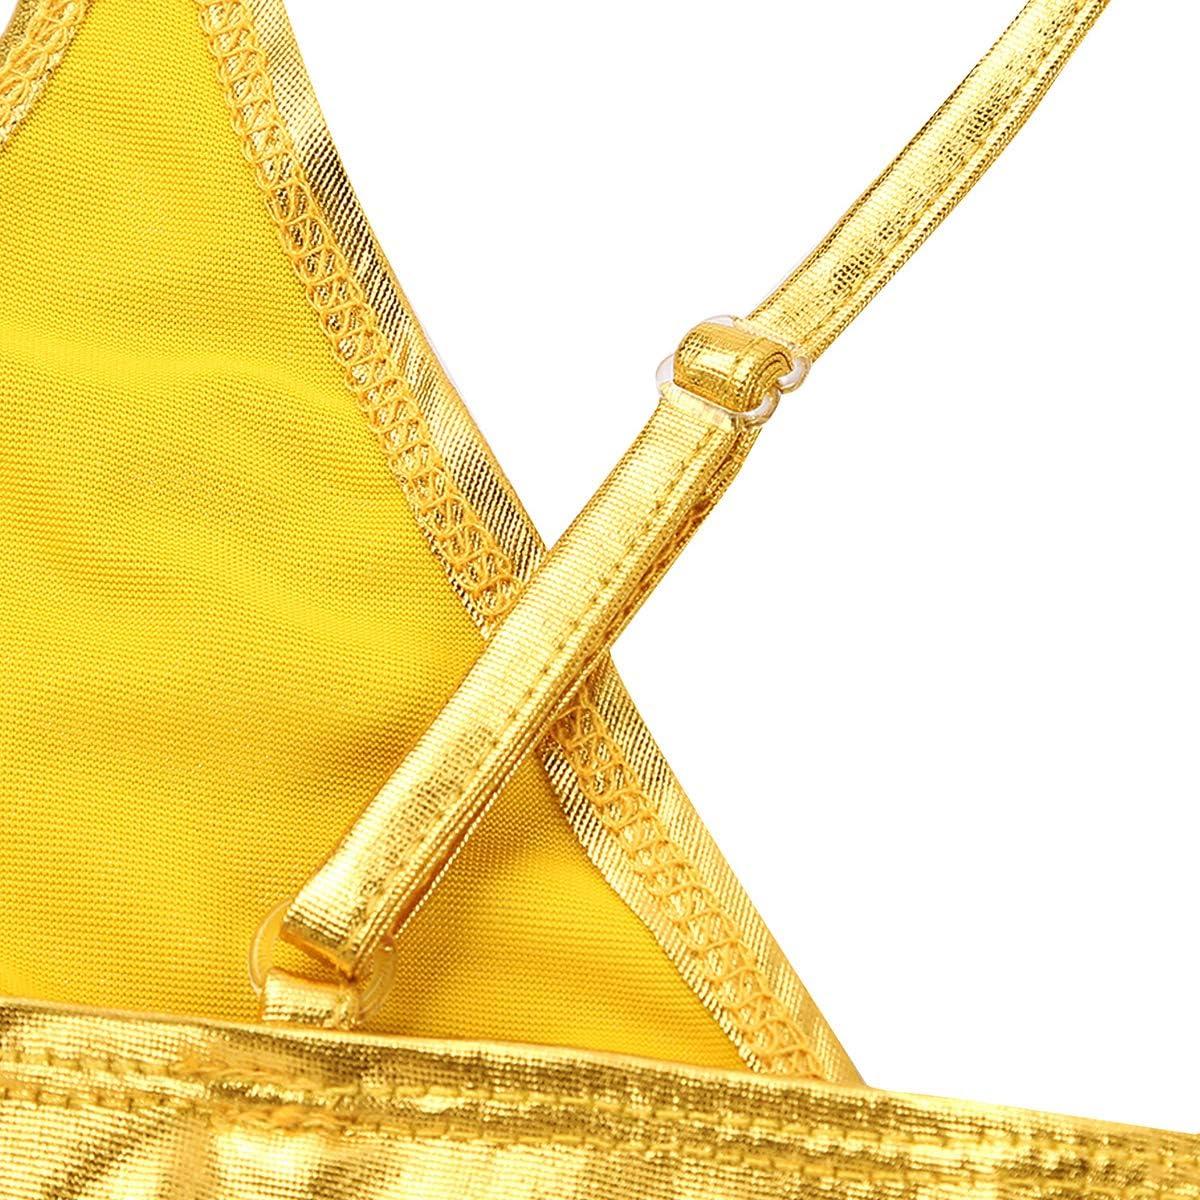 dPois Damen Gl/änzende Bikini Set Gekreuzte BH Bikinislip mit Spaghettitr/äger Badeanzug Hoher Beinausschnitt Bademode Swimwear